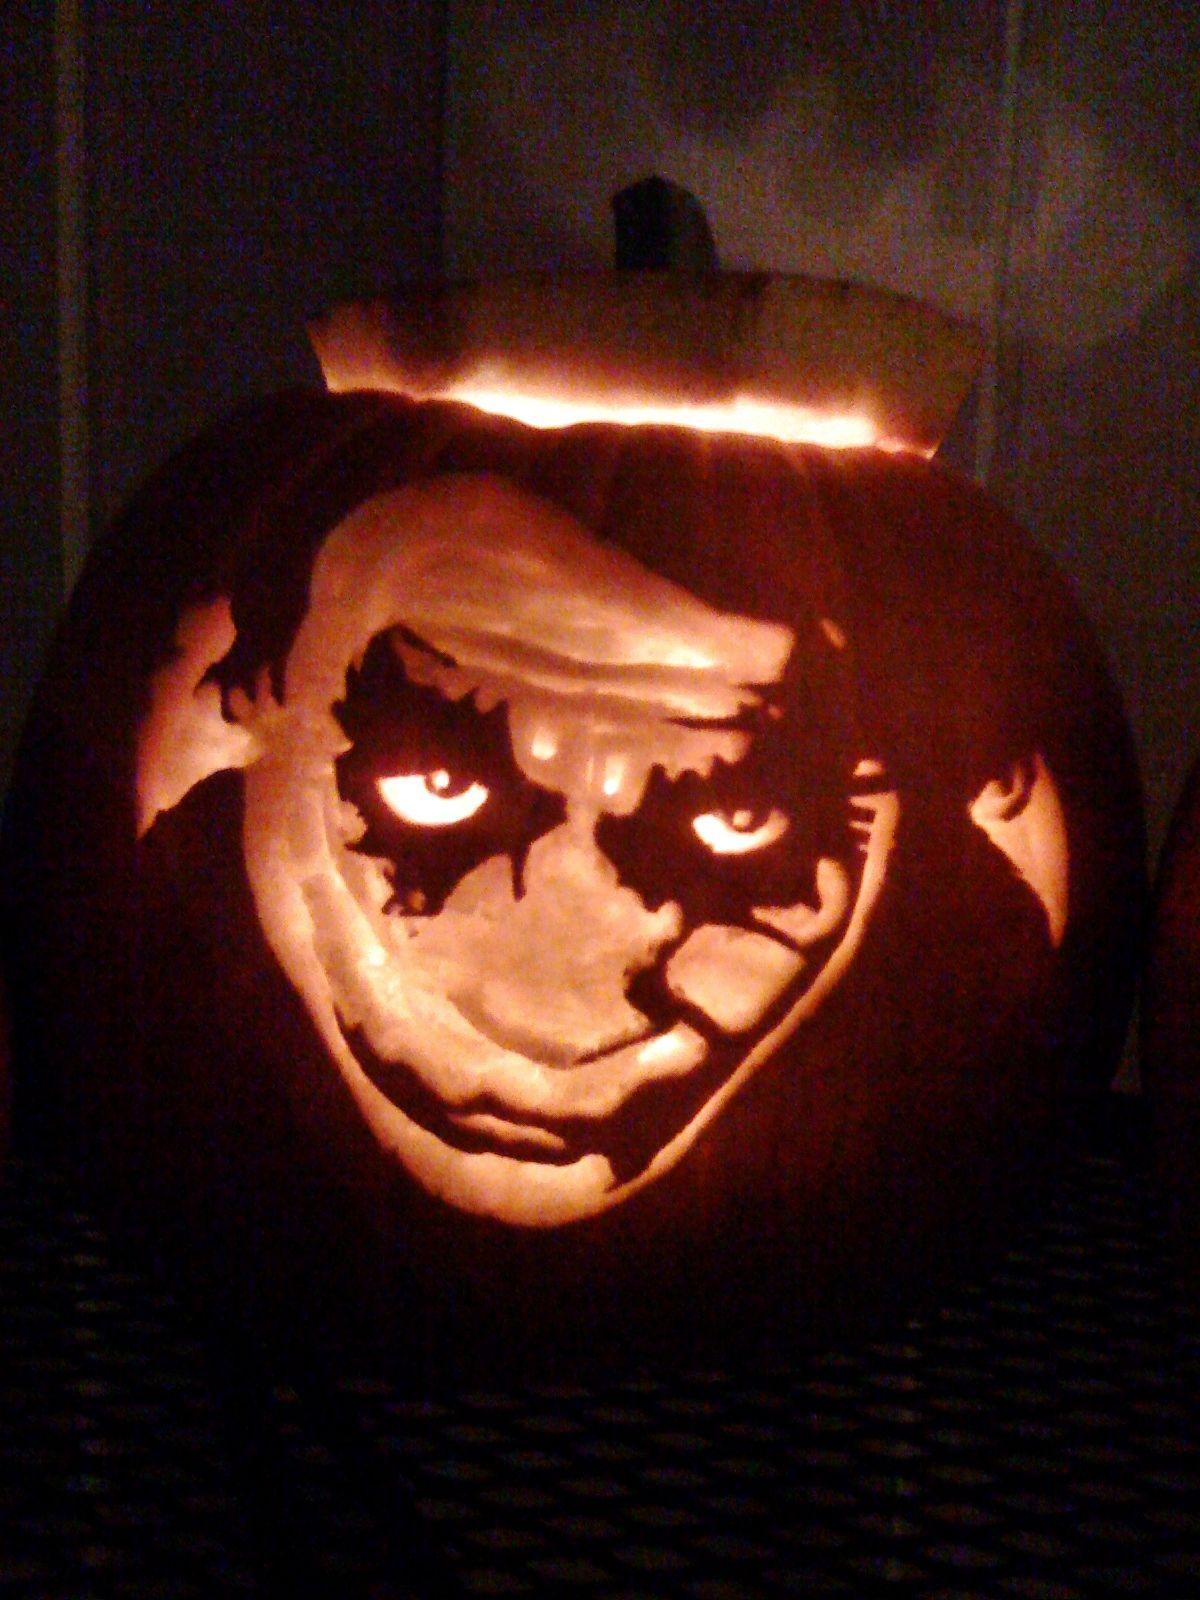 The joker dark knight carved pumpkin halloween